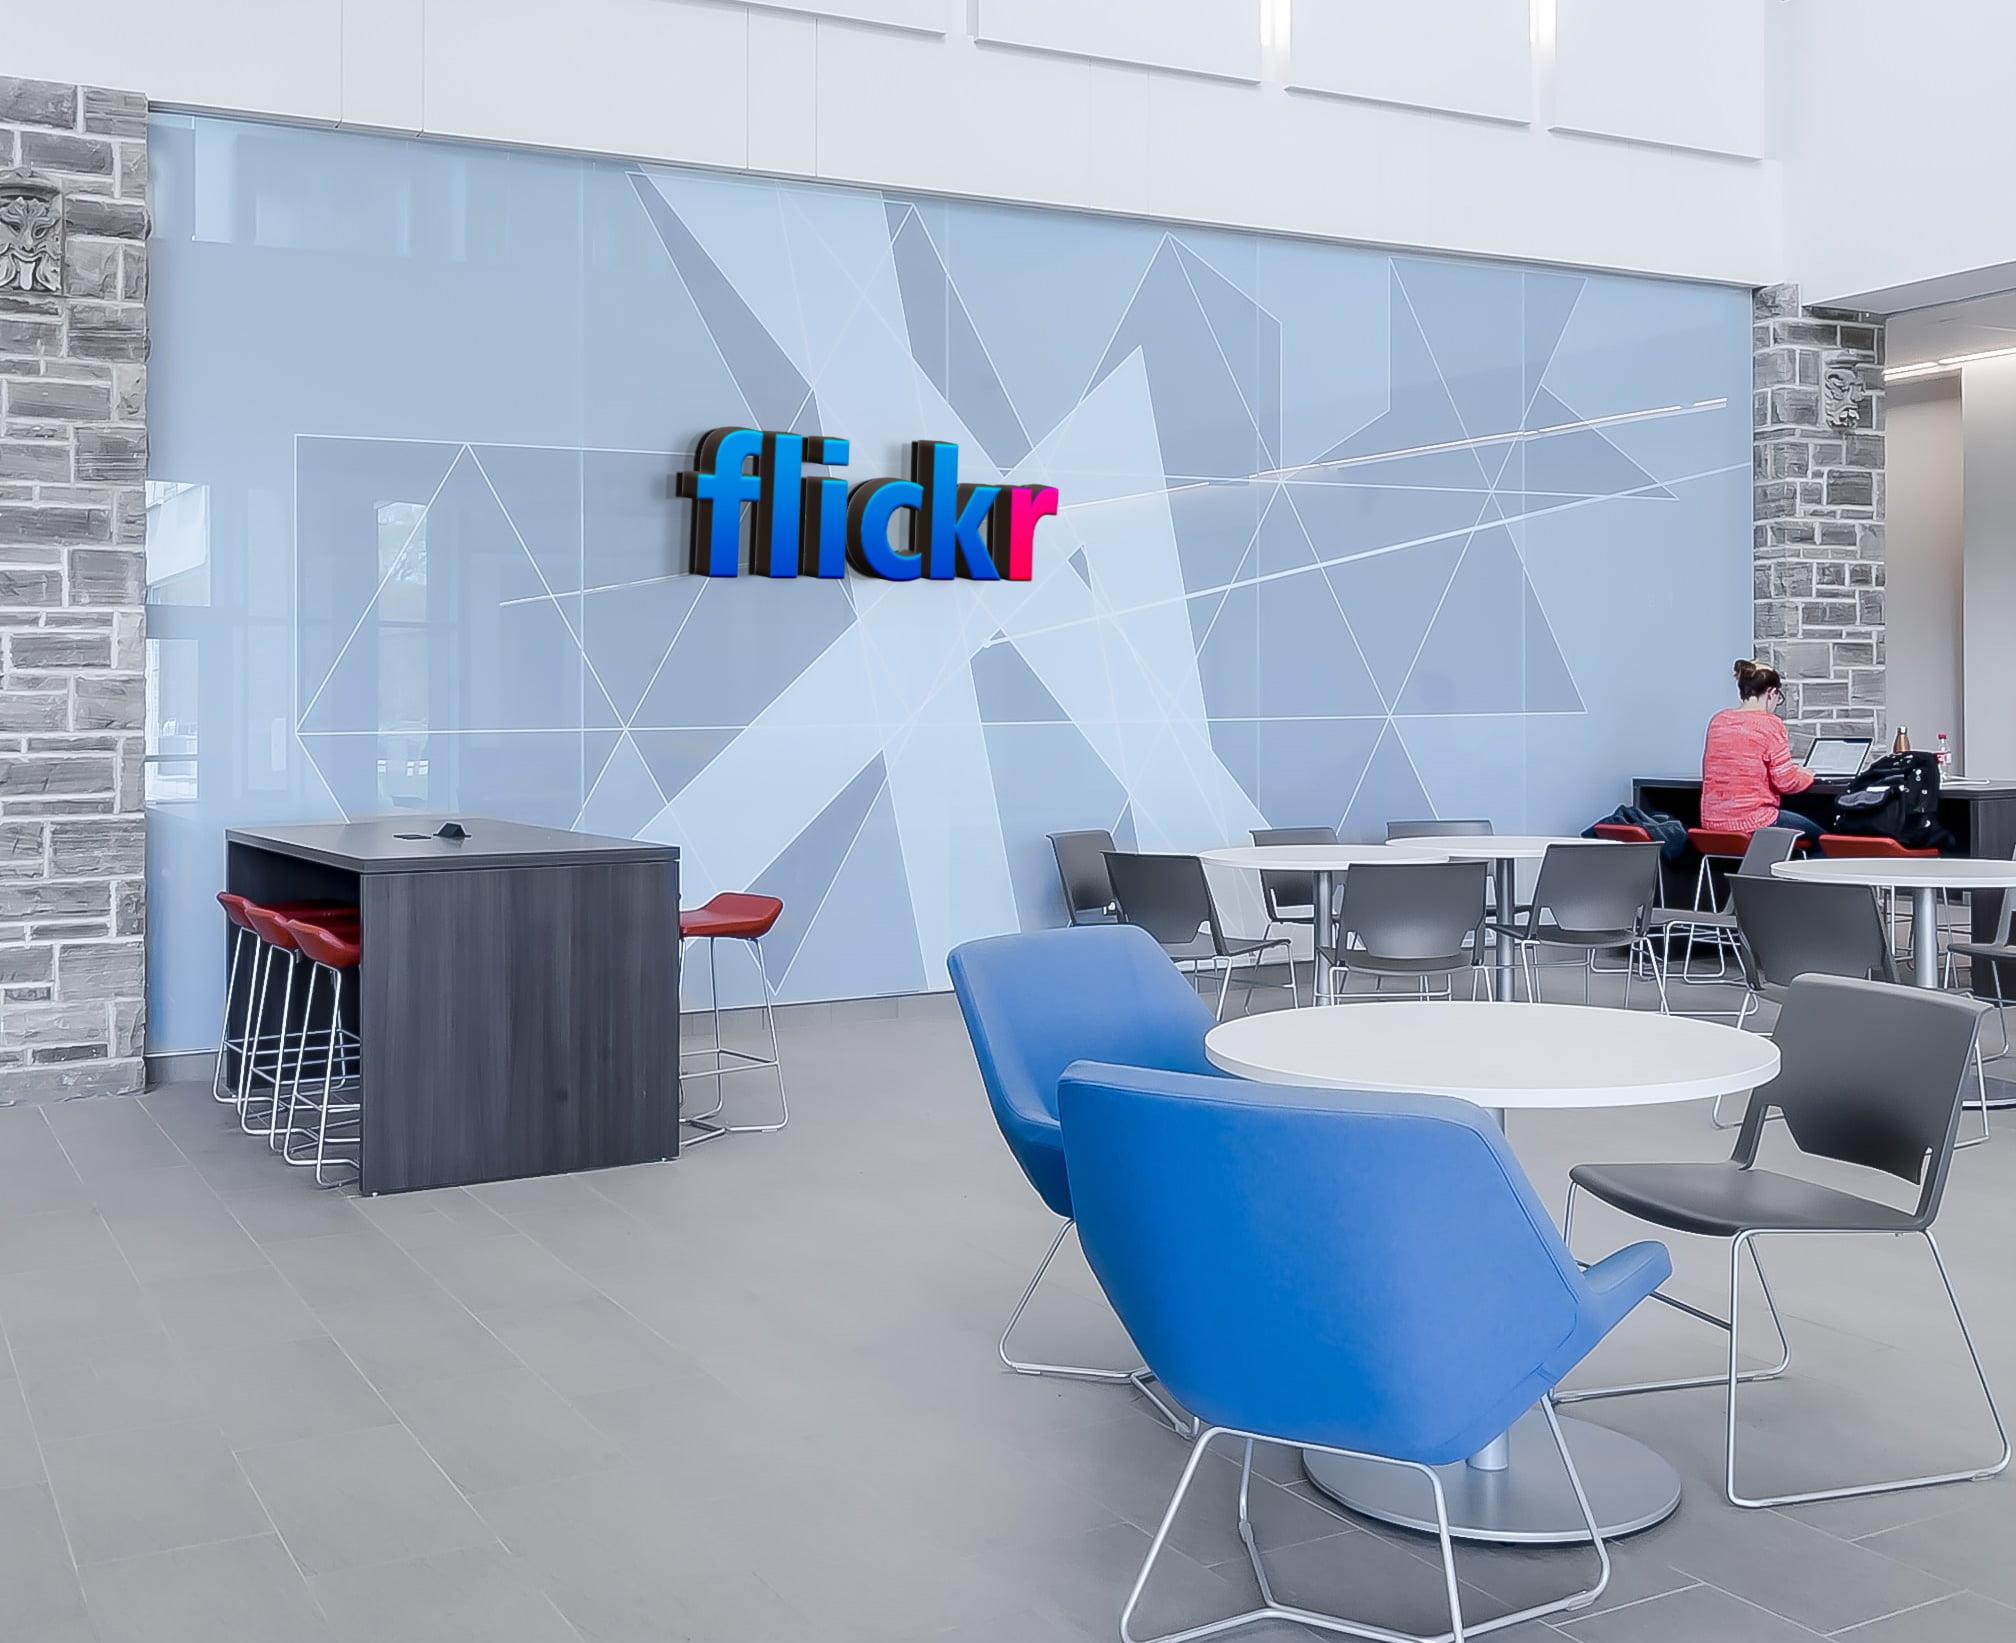 Flickr-Logo-Free-Lobby-Conference-Room-Mockup.jpg